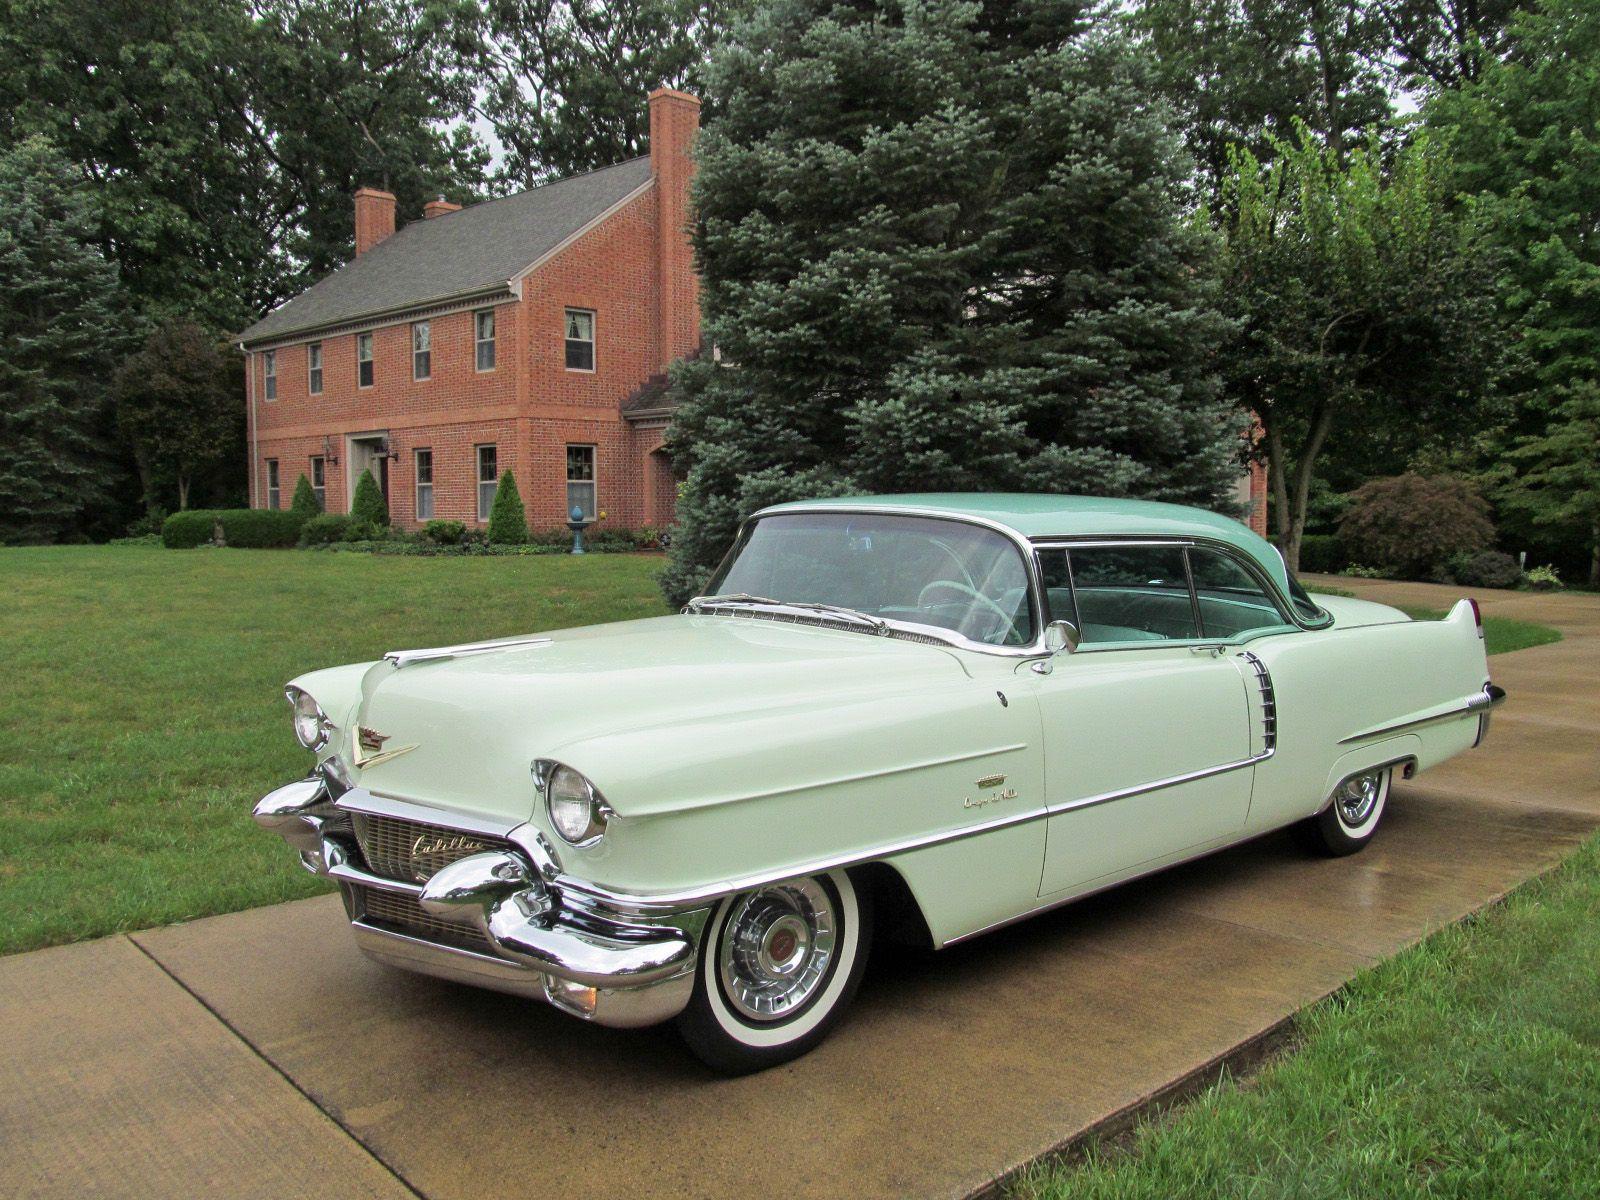 1956 Cadillac Coupe Deville Hardtop Coupe For Sale   AutaBuy.com